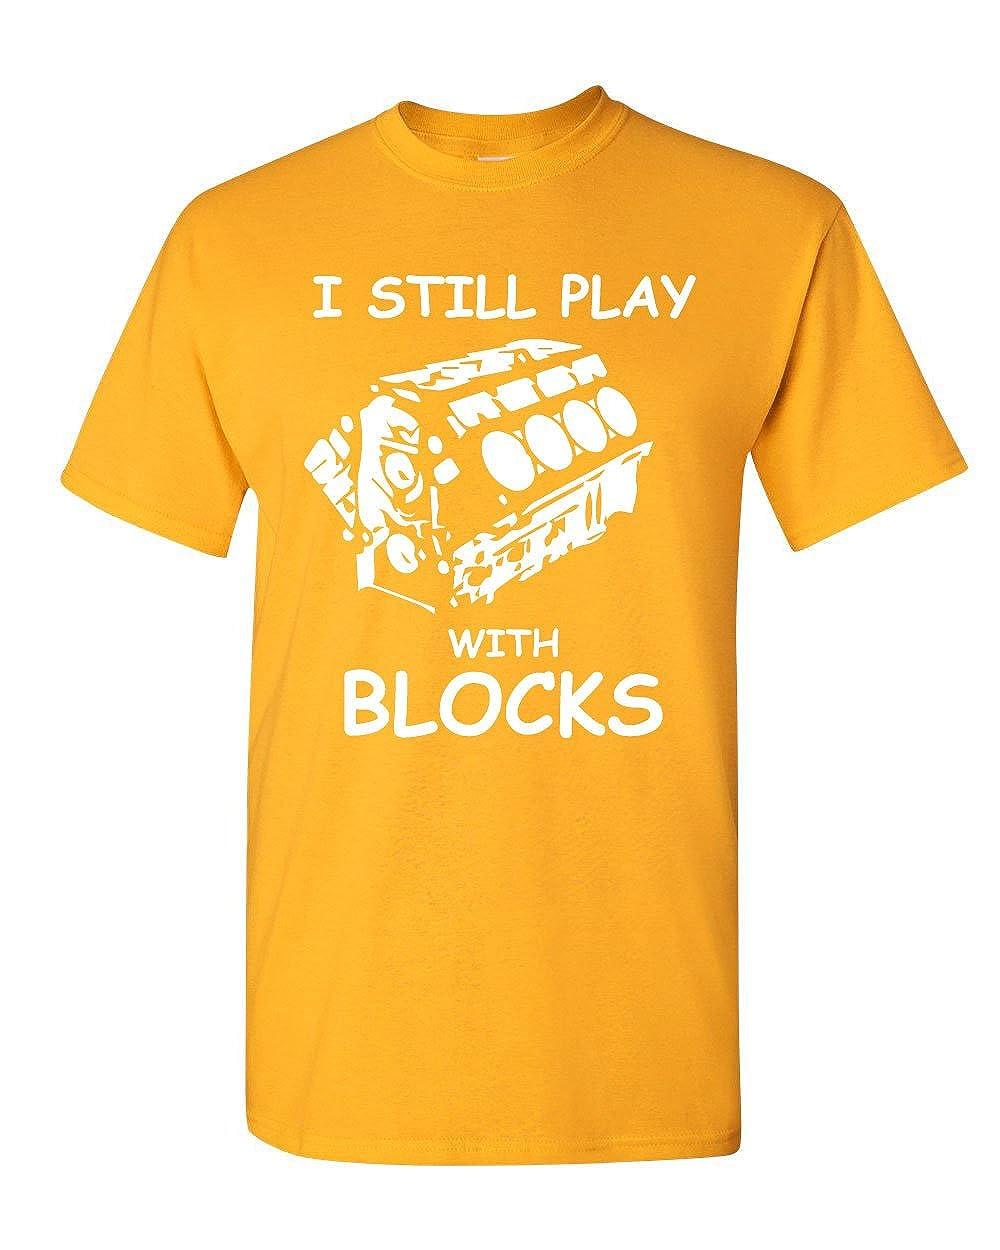 c32216ff0c I Still Play with Blocks T-Shirt Funny Car Mechanic Engine Tee Shirt |  Amazon.com